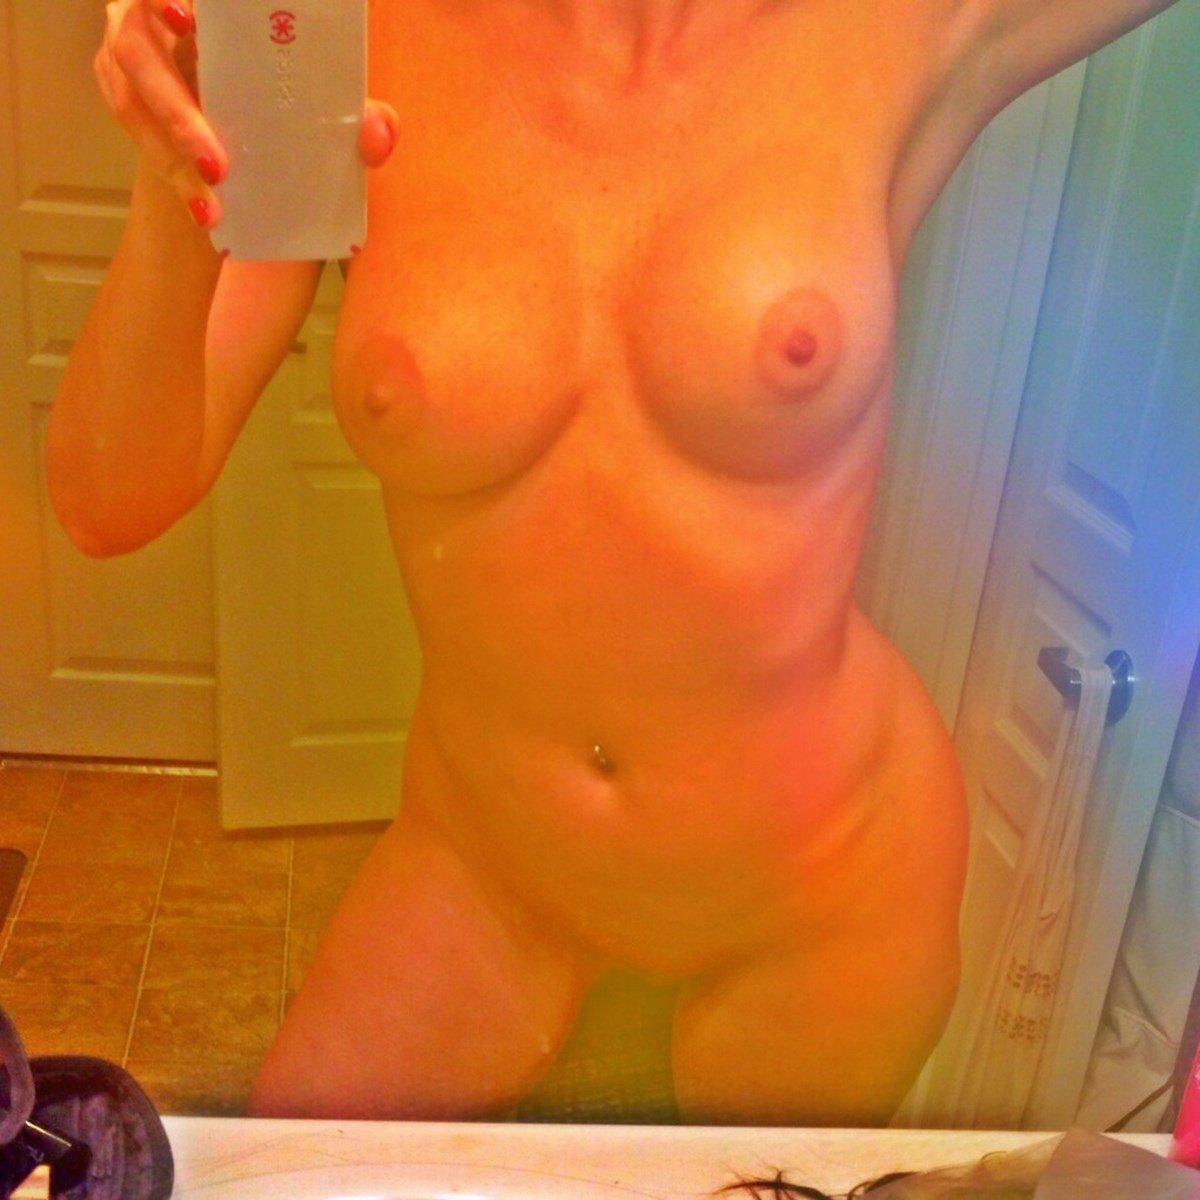 "Tanea ""Rebel"" Brooks Nude Photos Leaked"